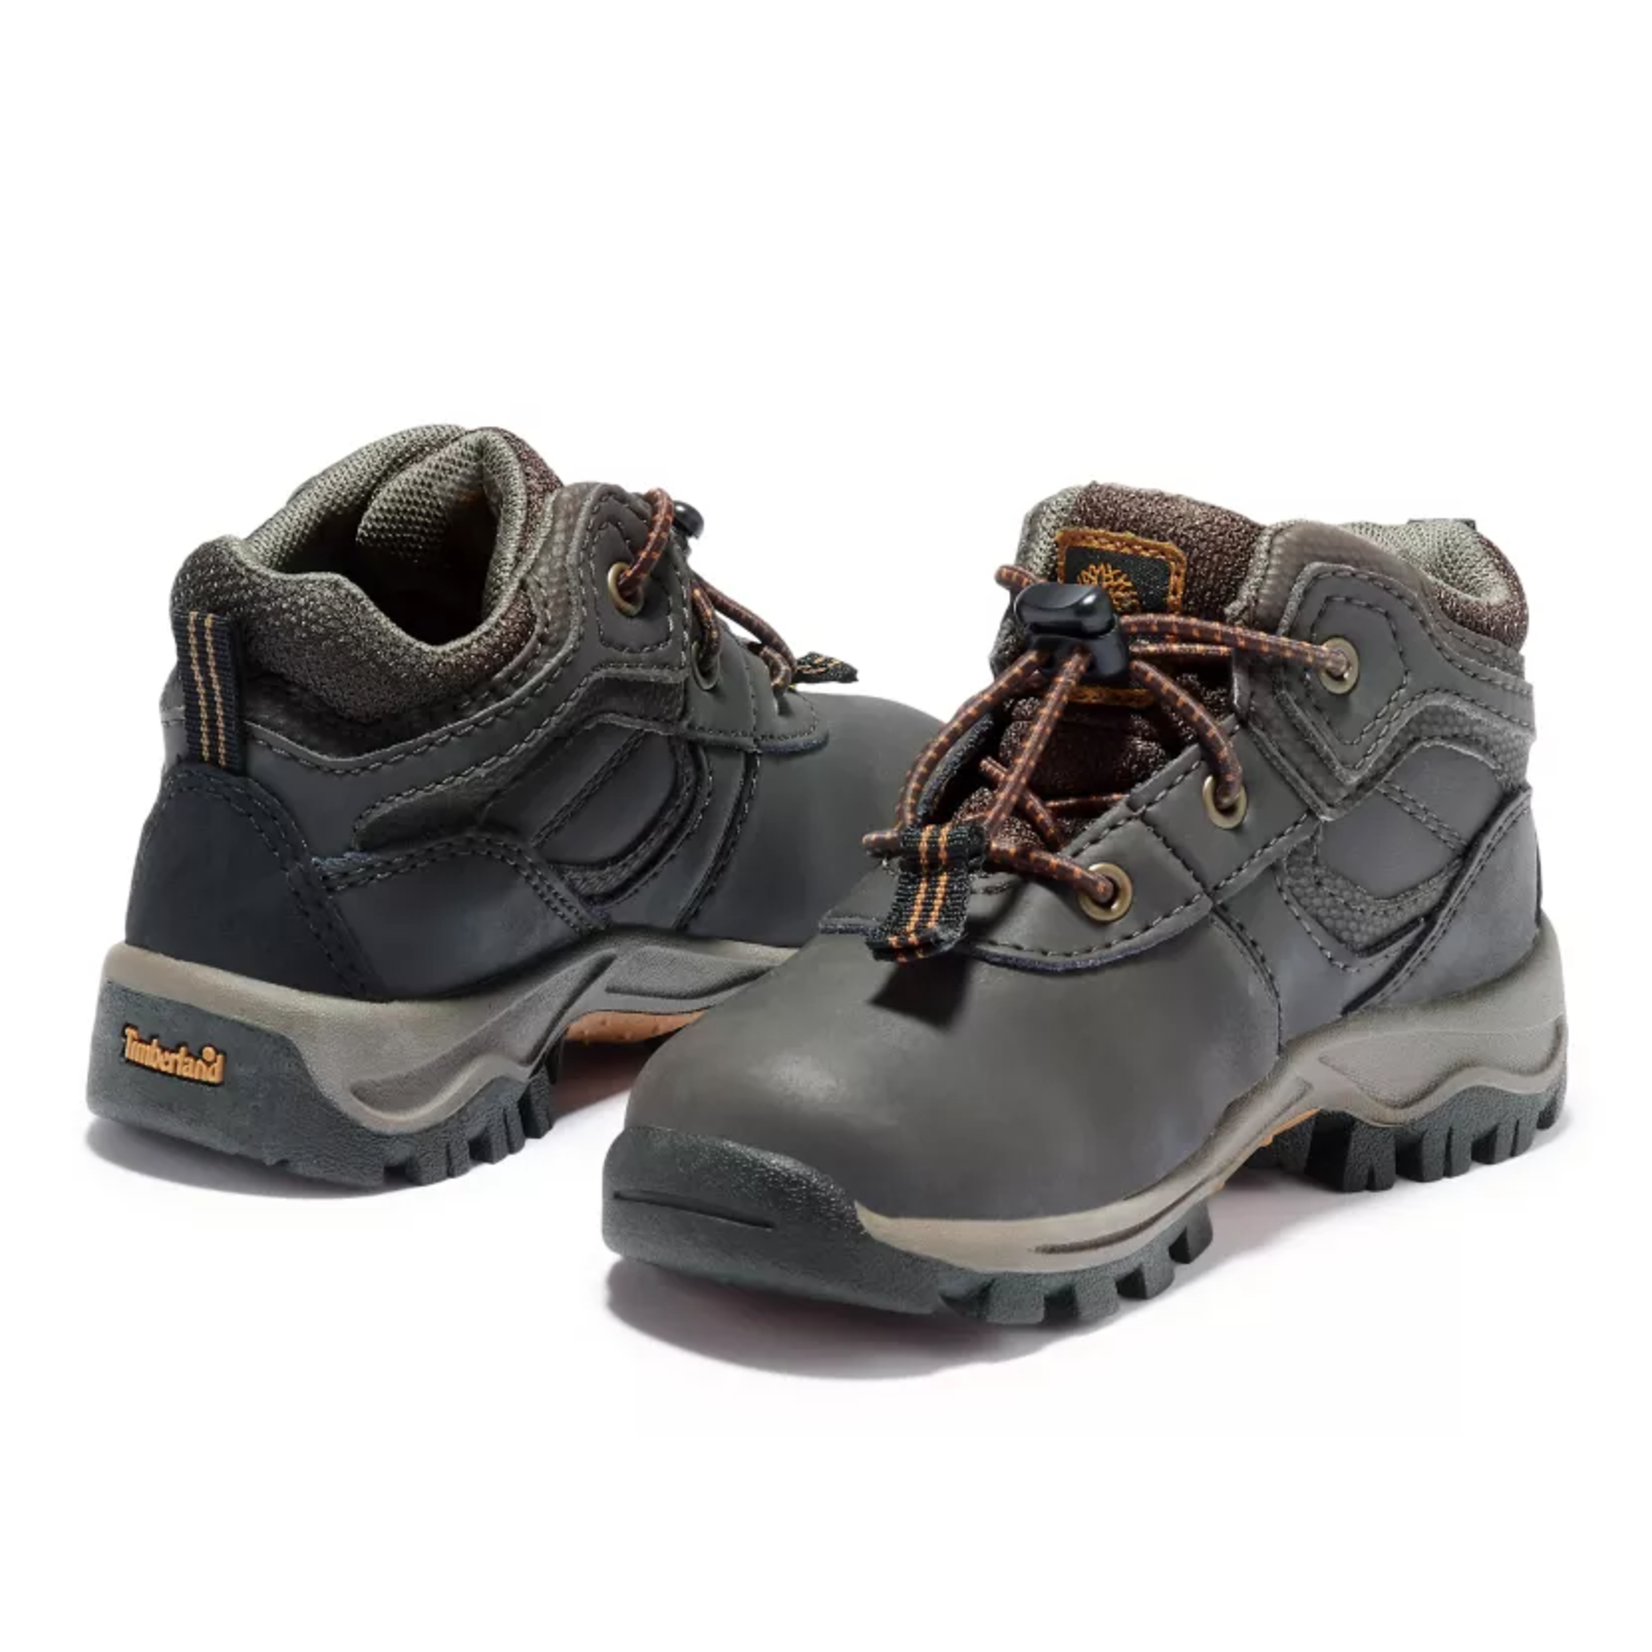 Timberland Timberland Toddler Mt. Maddsen Waterproof Hiking Boots - TB0A14IX